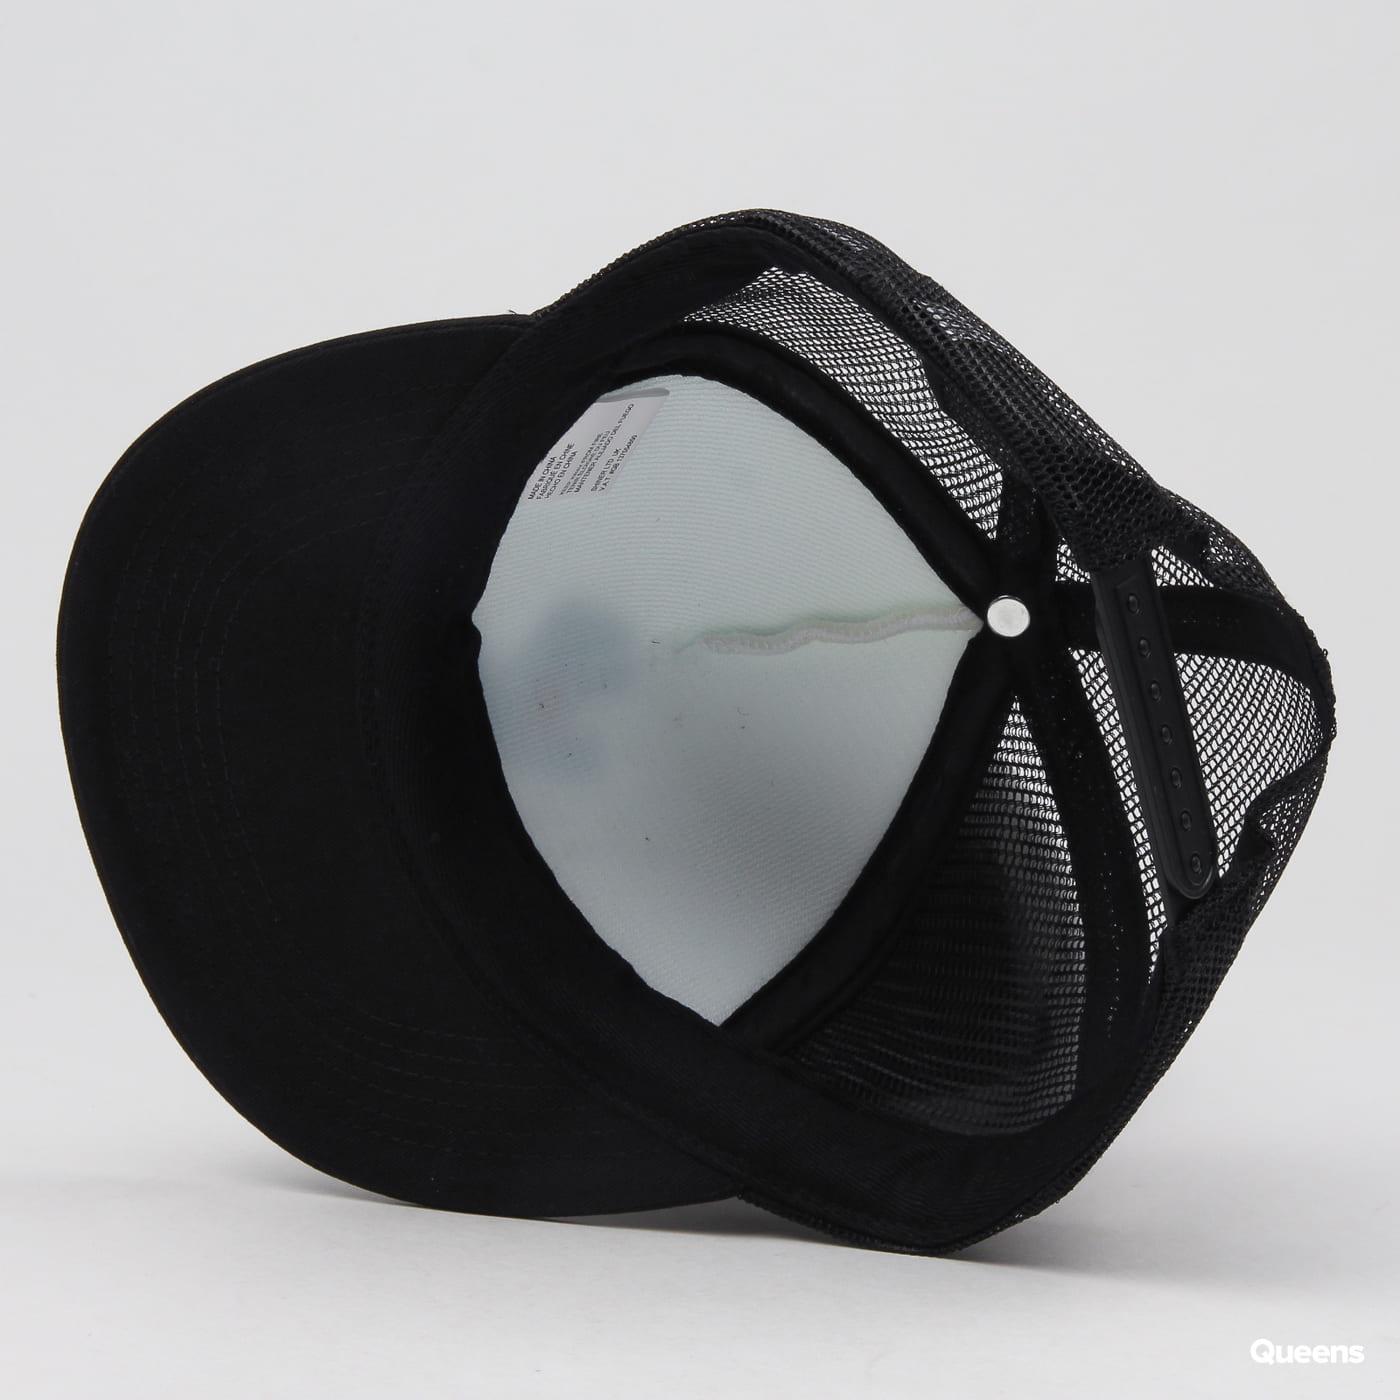 Santa Cruz Classic Hand Mesh Cap black / white